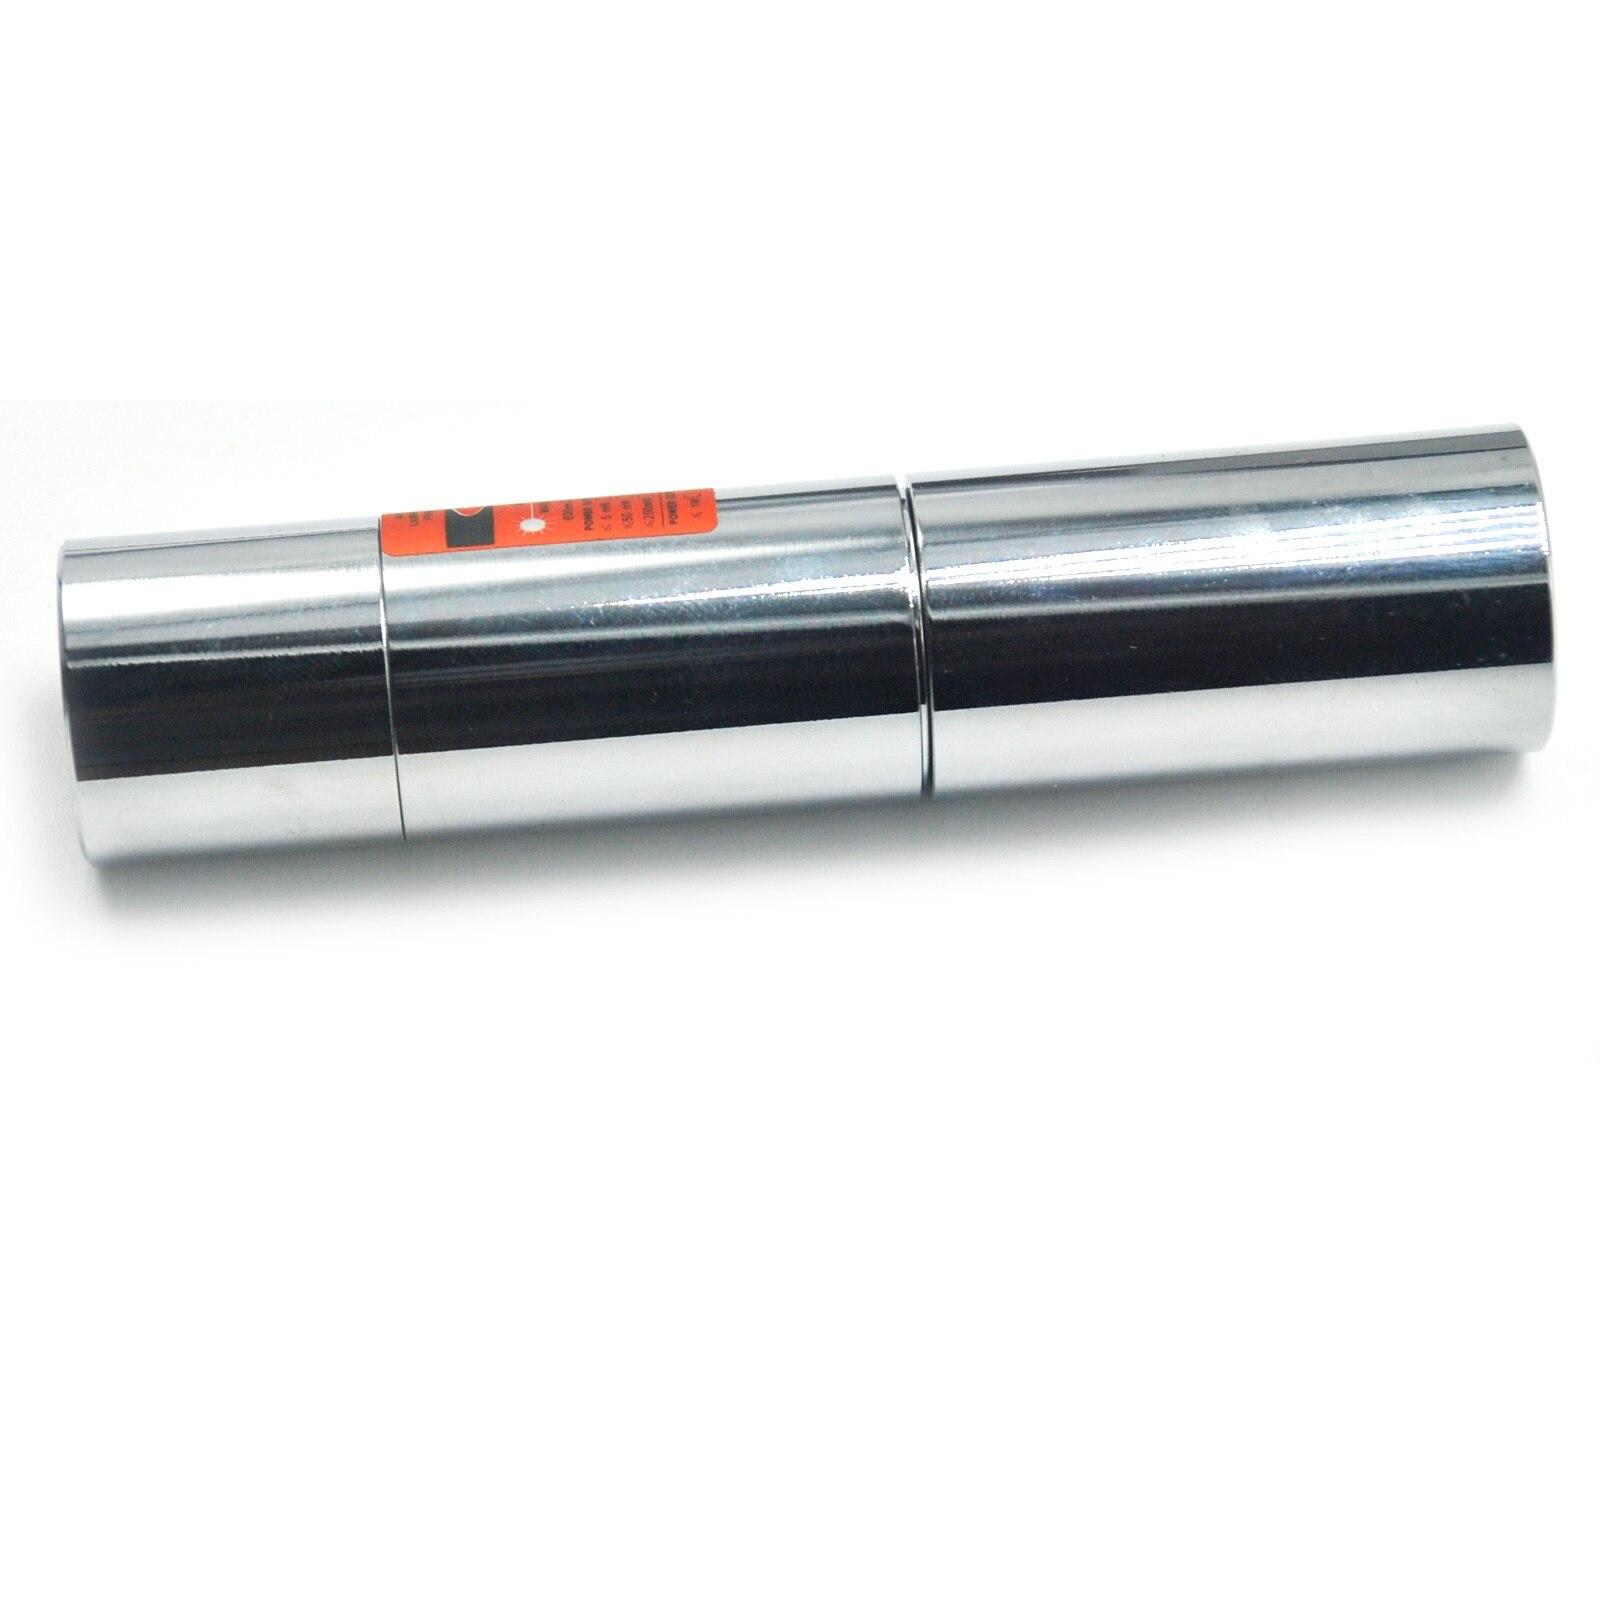 Waterproof 488nm Cyan-Blue Light Flashlight Torch DS2 488T-60 Adjust Focus Laser Pointer